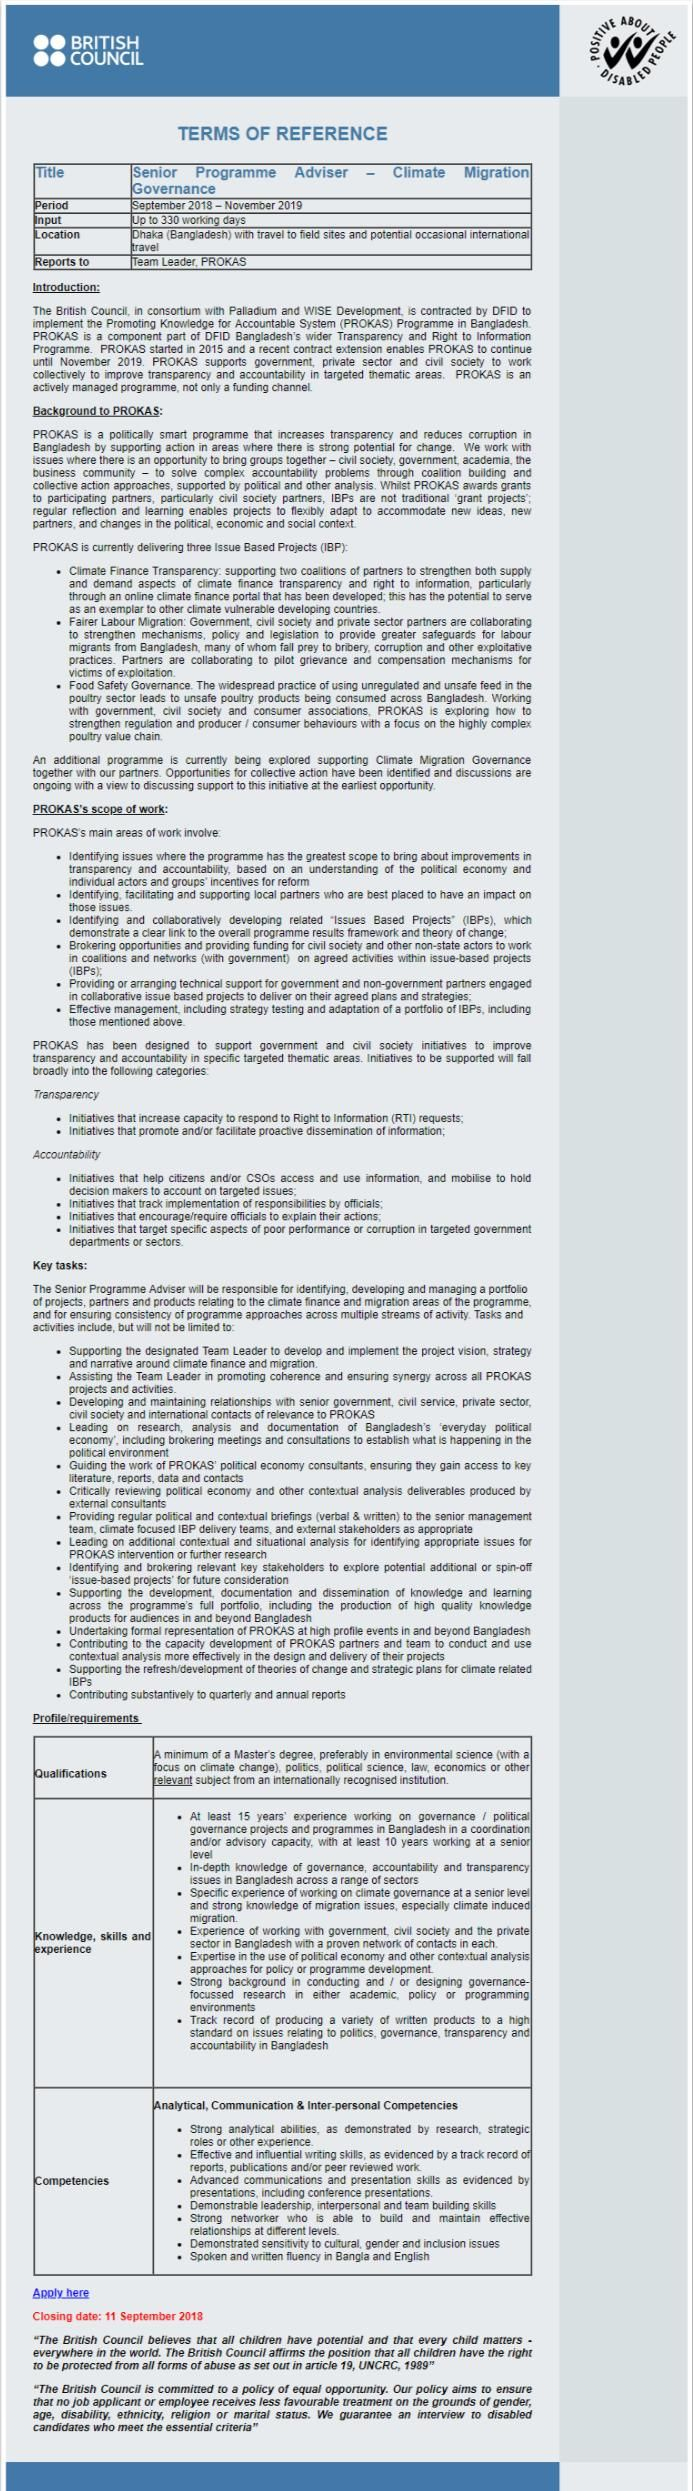 British Council Job Circular Application Form 2018 - britishcouncil ...